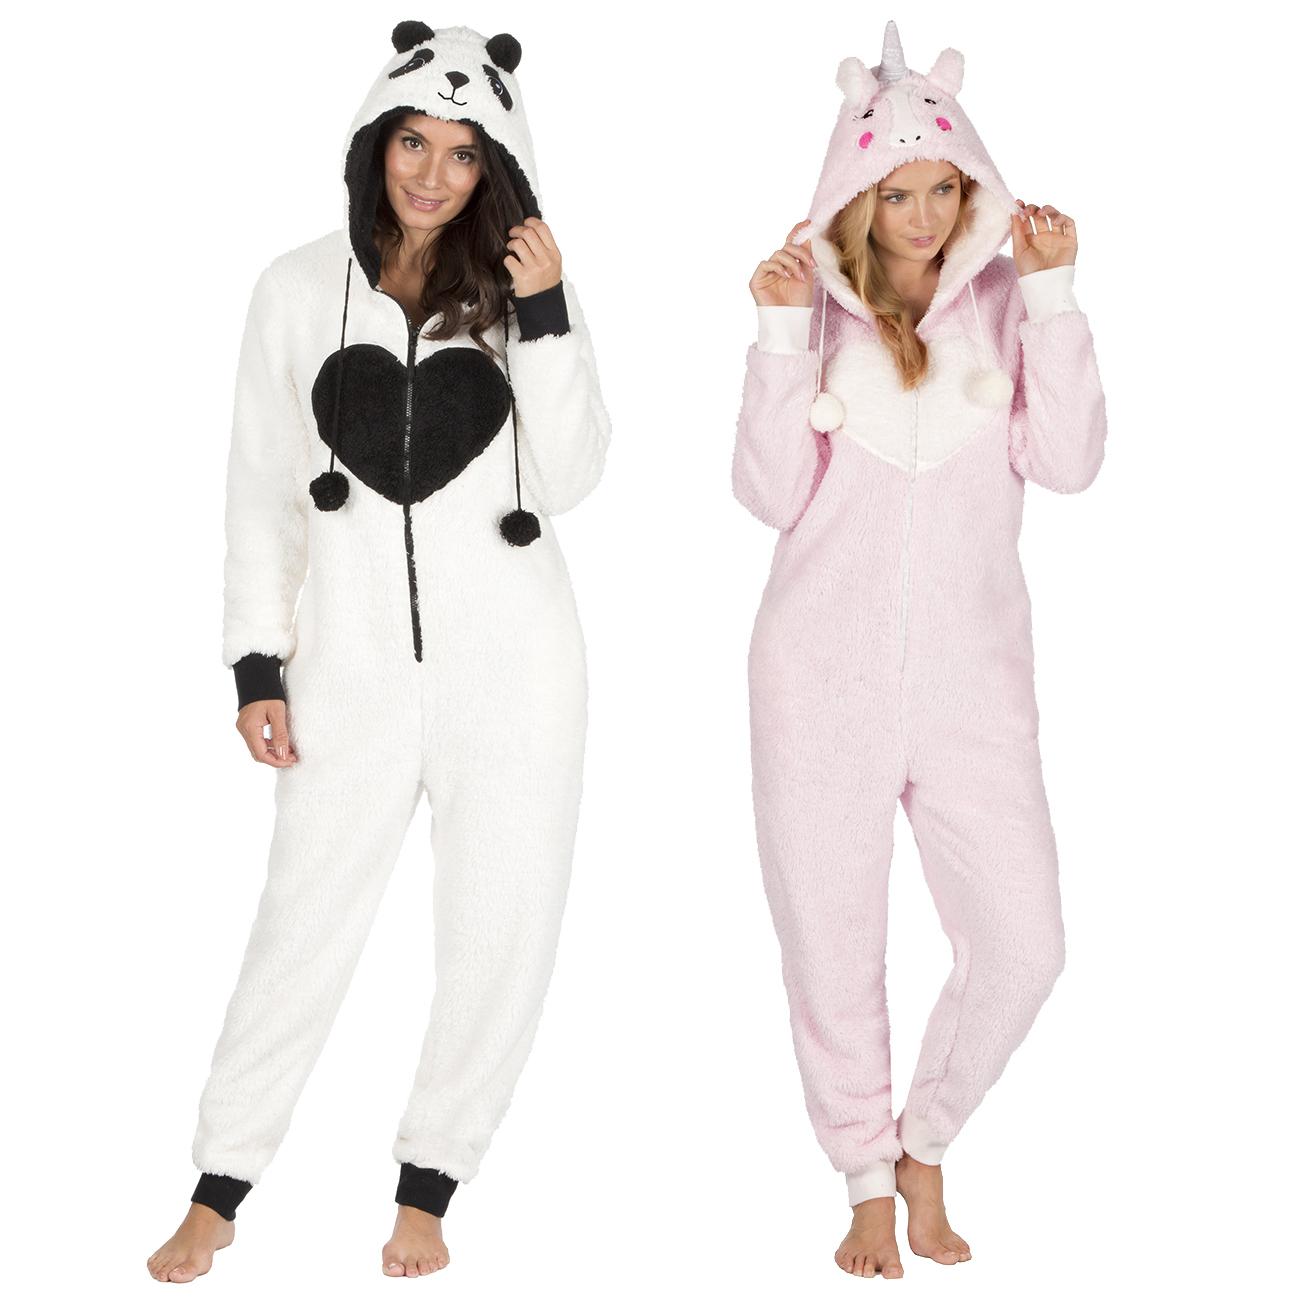 b305a66ef27b4 Onezee Womens Ladies Novelty Jumpsuit Snuggle Fleece Panda Unicorn Hooded  Lounge